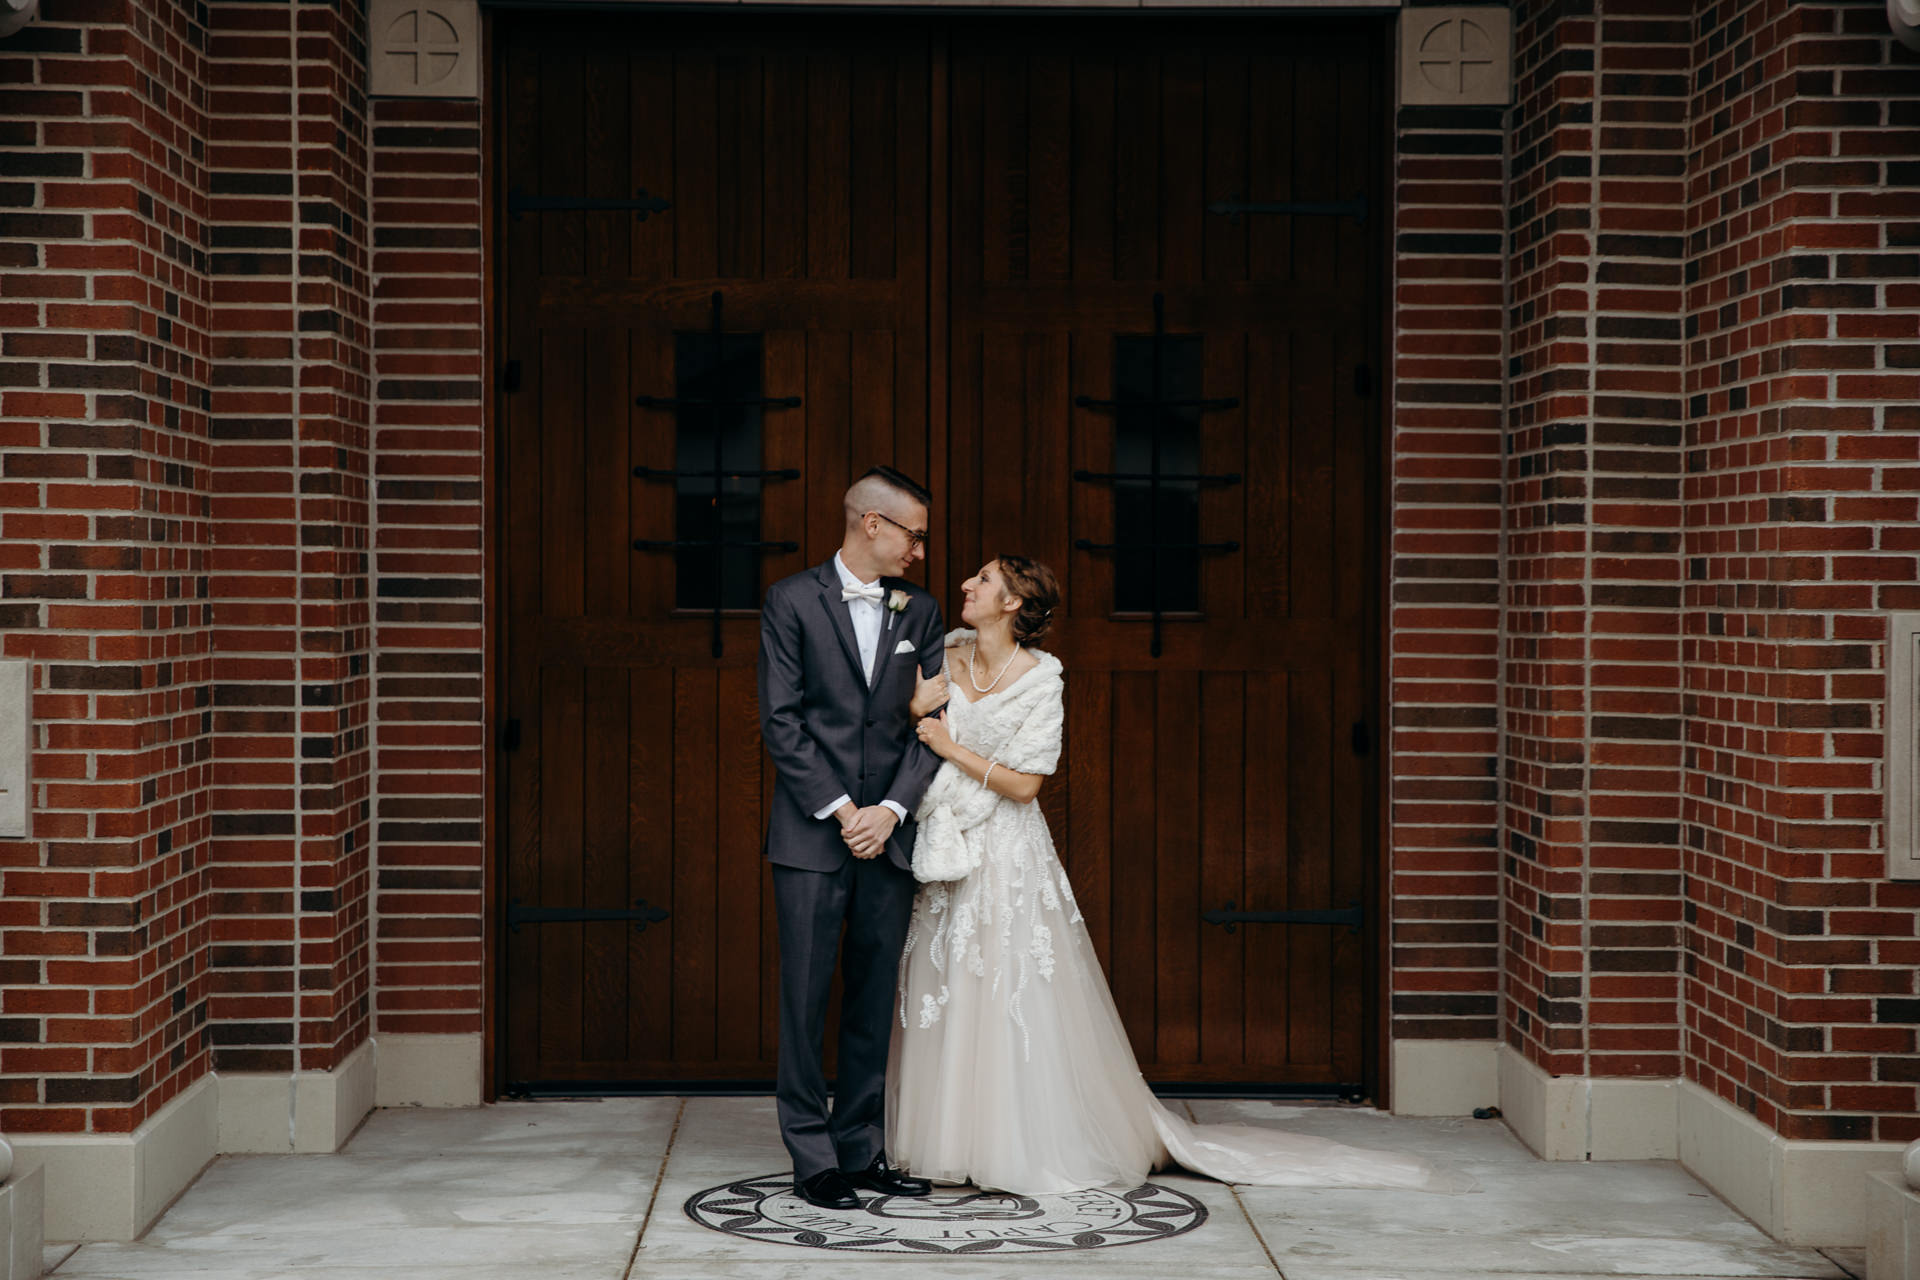 Armory wedding south bend grant beachy photography elkhart goshen -027.jpg